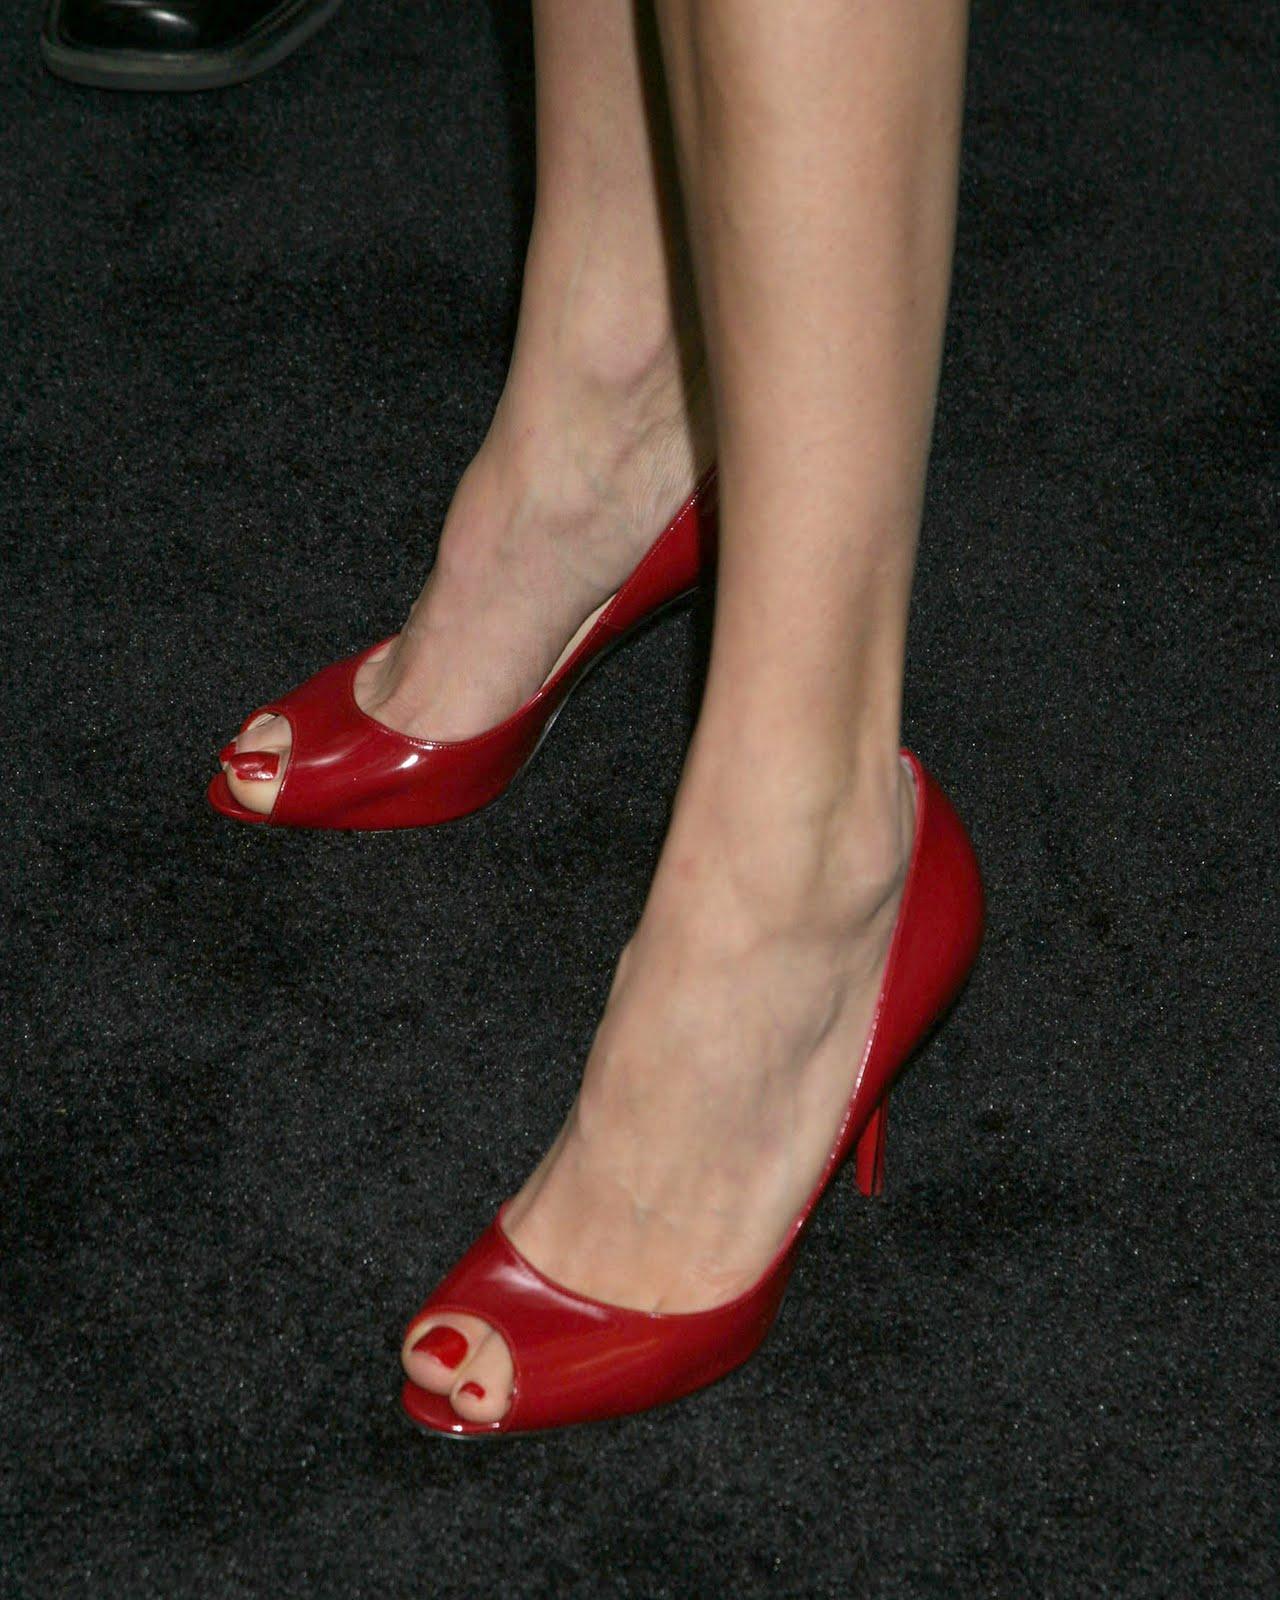 http://2.bp.blogspot.com/_UaLWp72nij4/TBm3S1aXbYI/AAAAAAAAPQY/OciQJS2PRT0/s1600/angelina-jolie.jpg